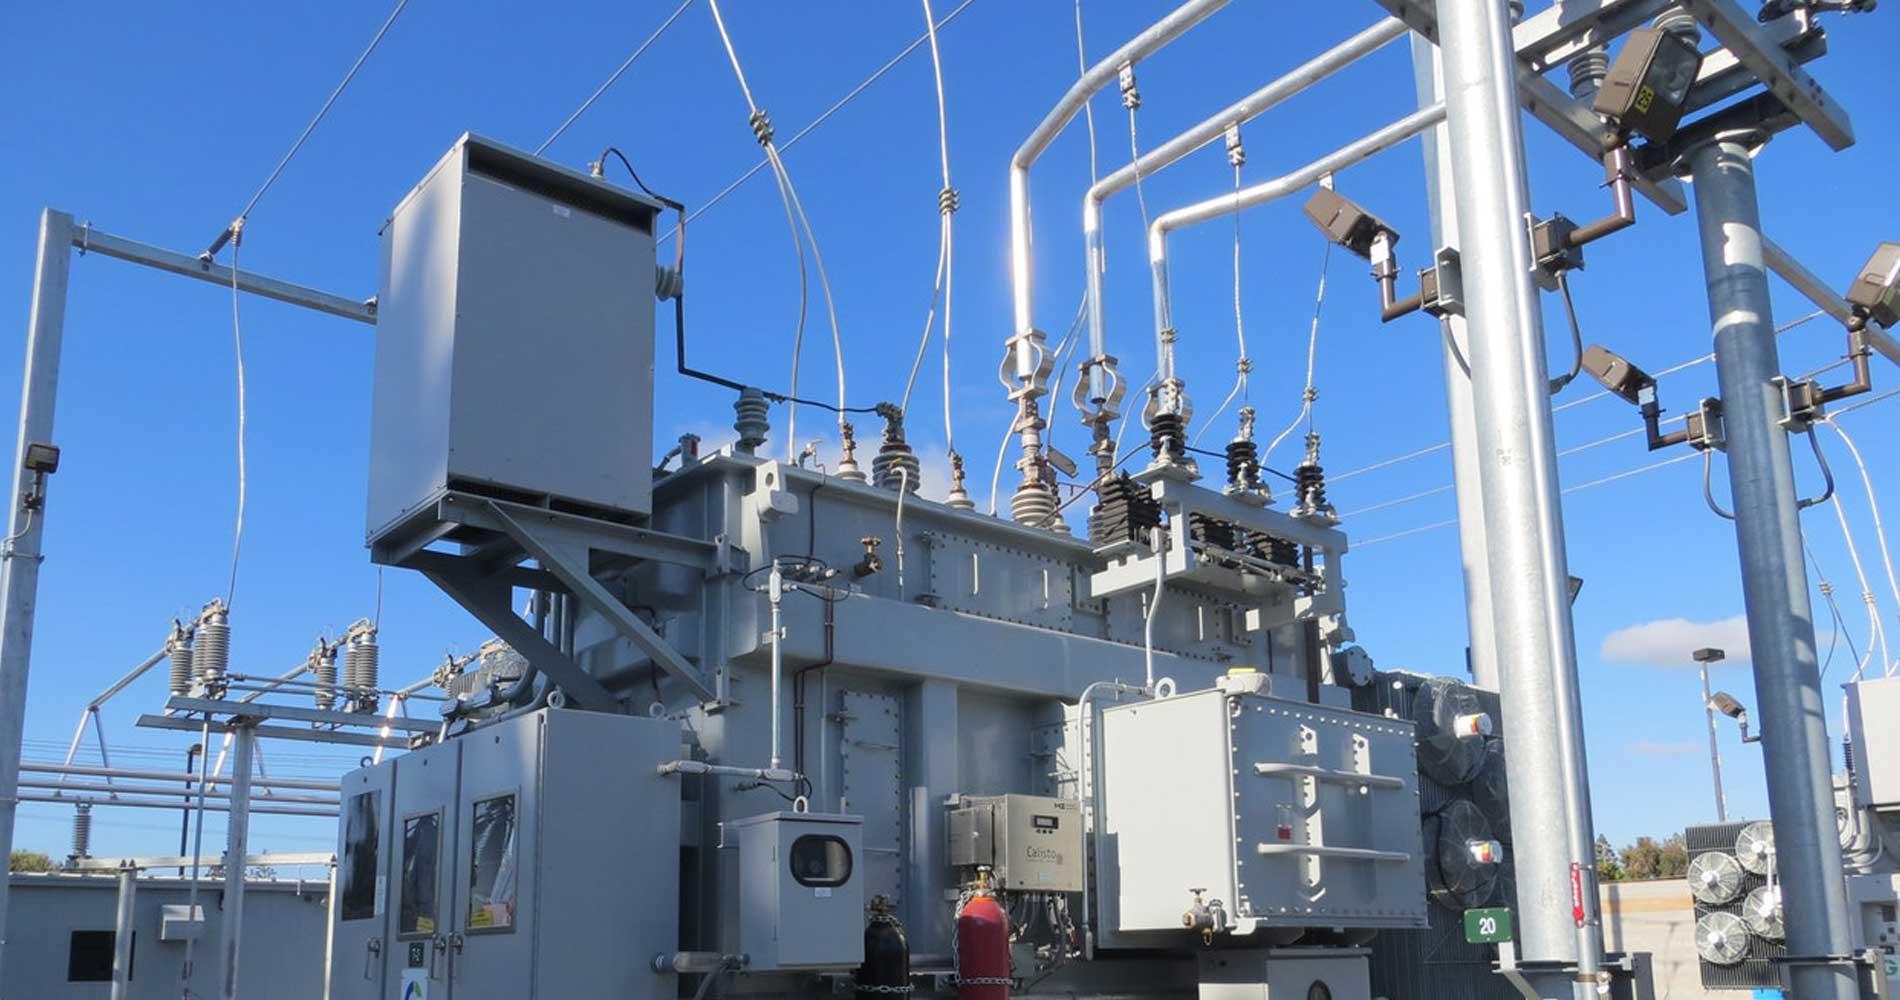 Referenzstory Frank H. Erlenkamp – Branche: Energieversorgung